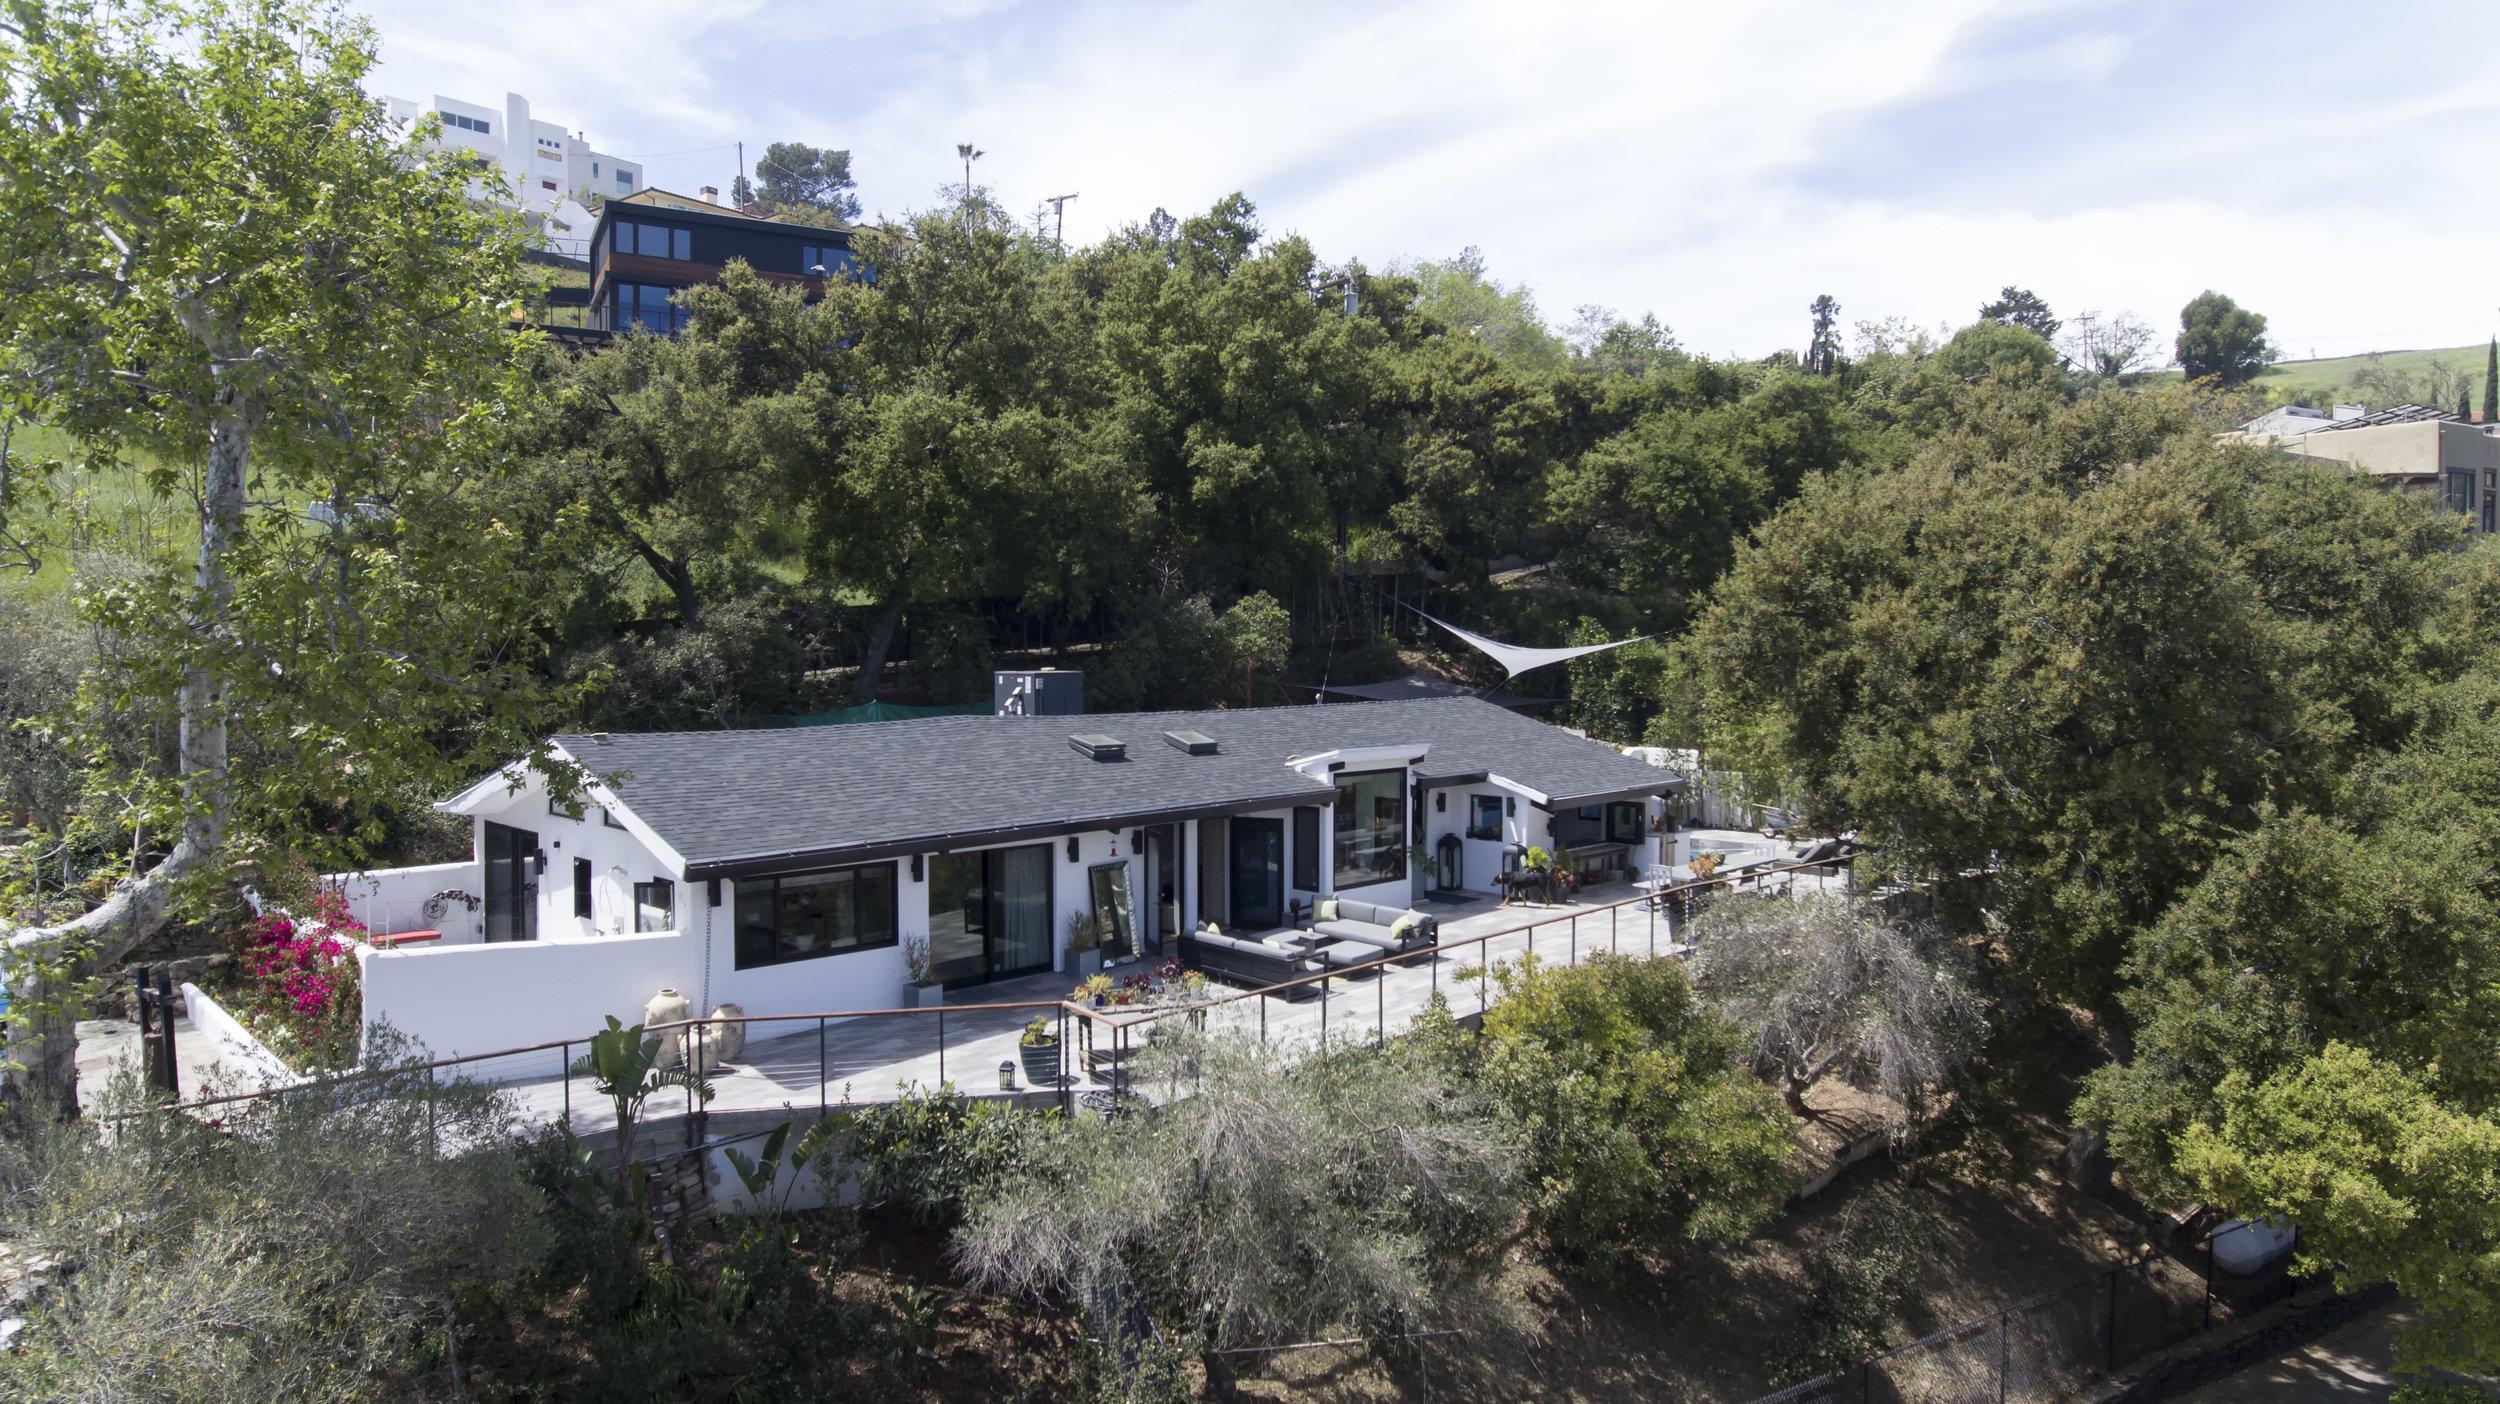 033 Exterior 26272 Cool Glen Way Malibu For Sale Luxury Real Estate.jpg